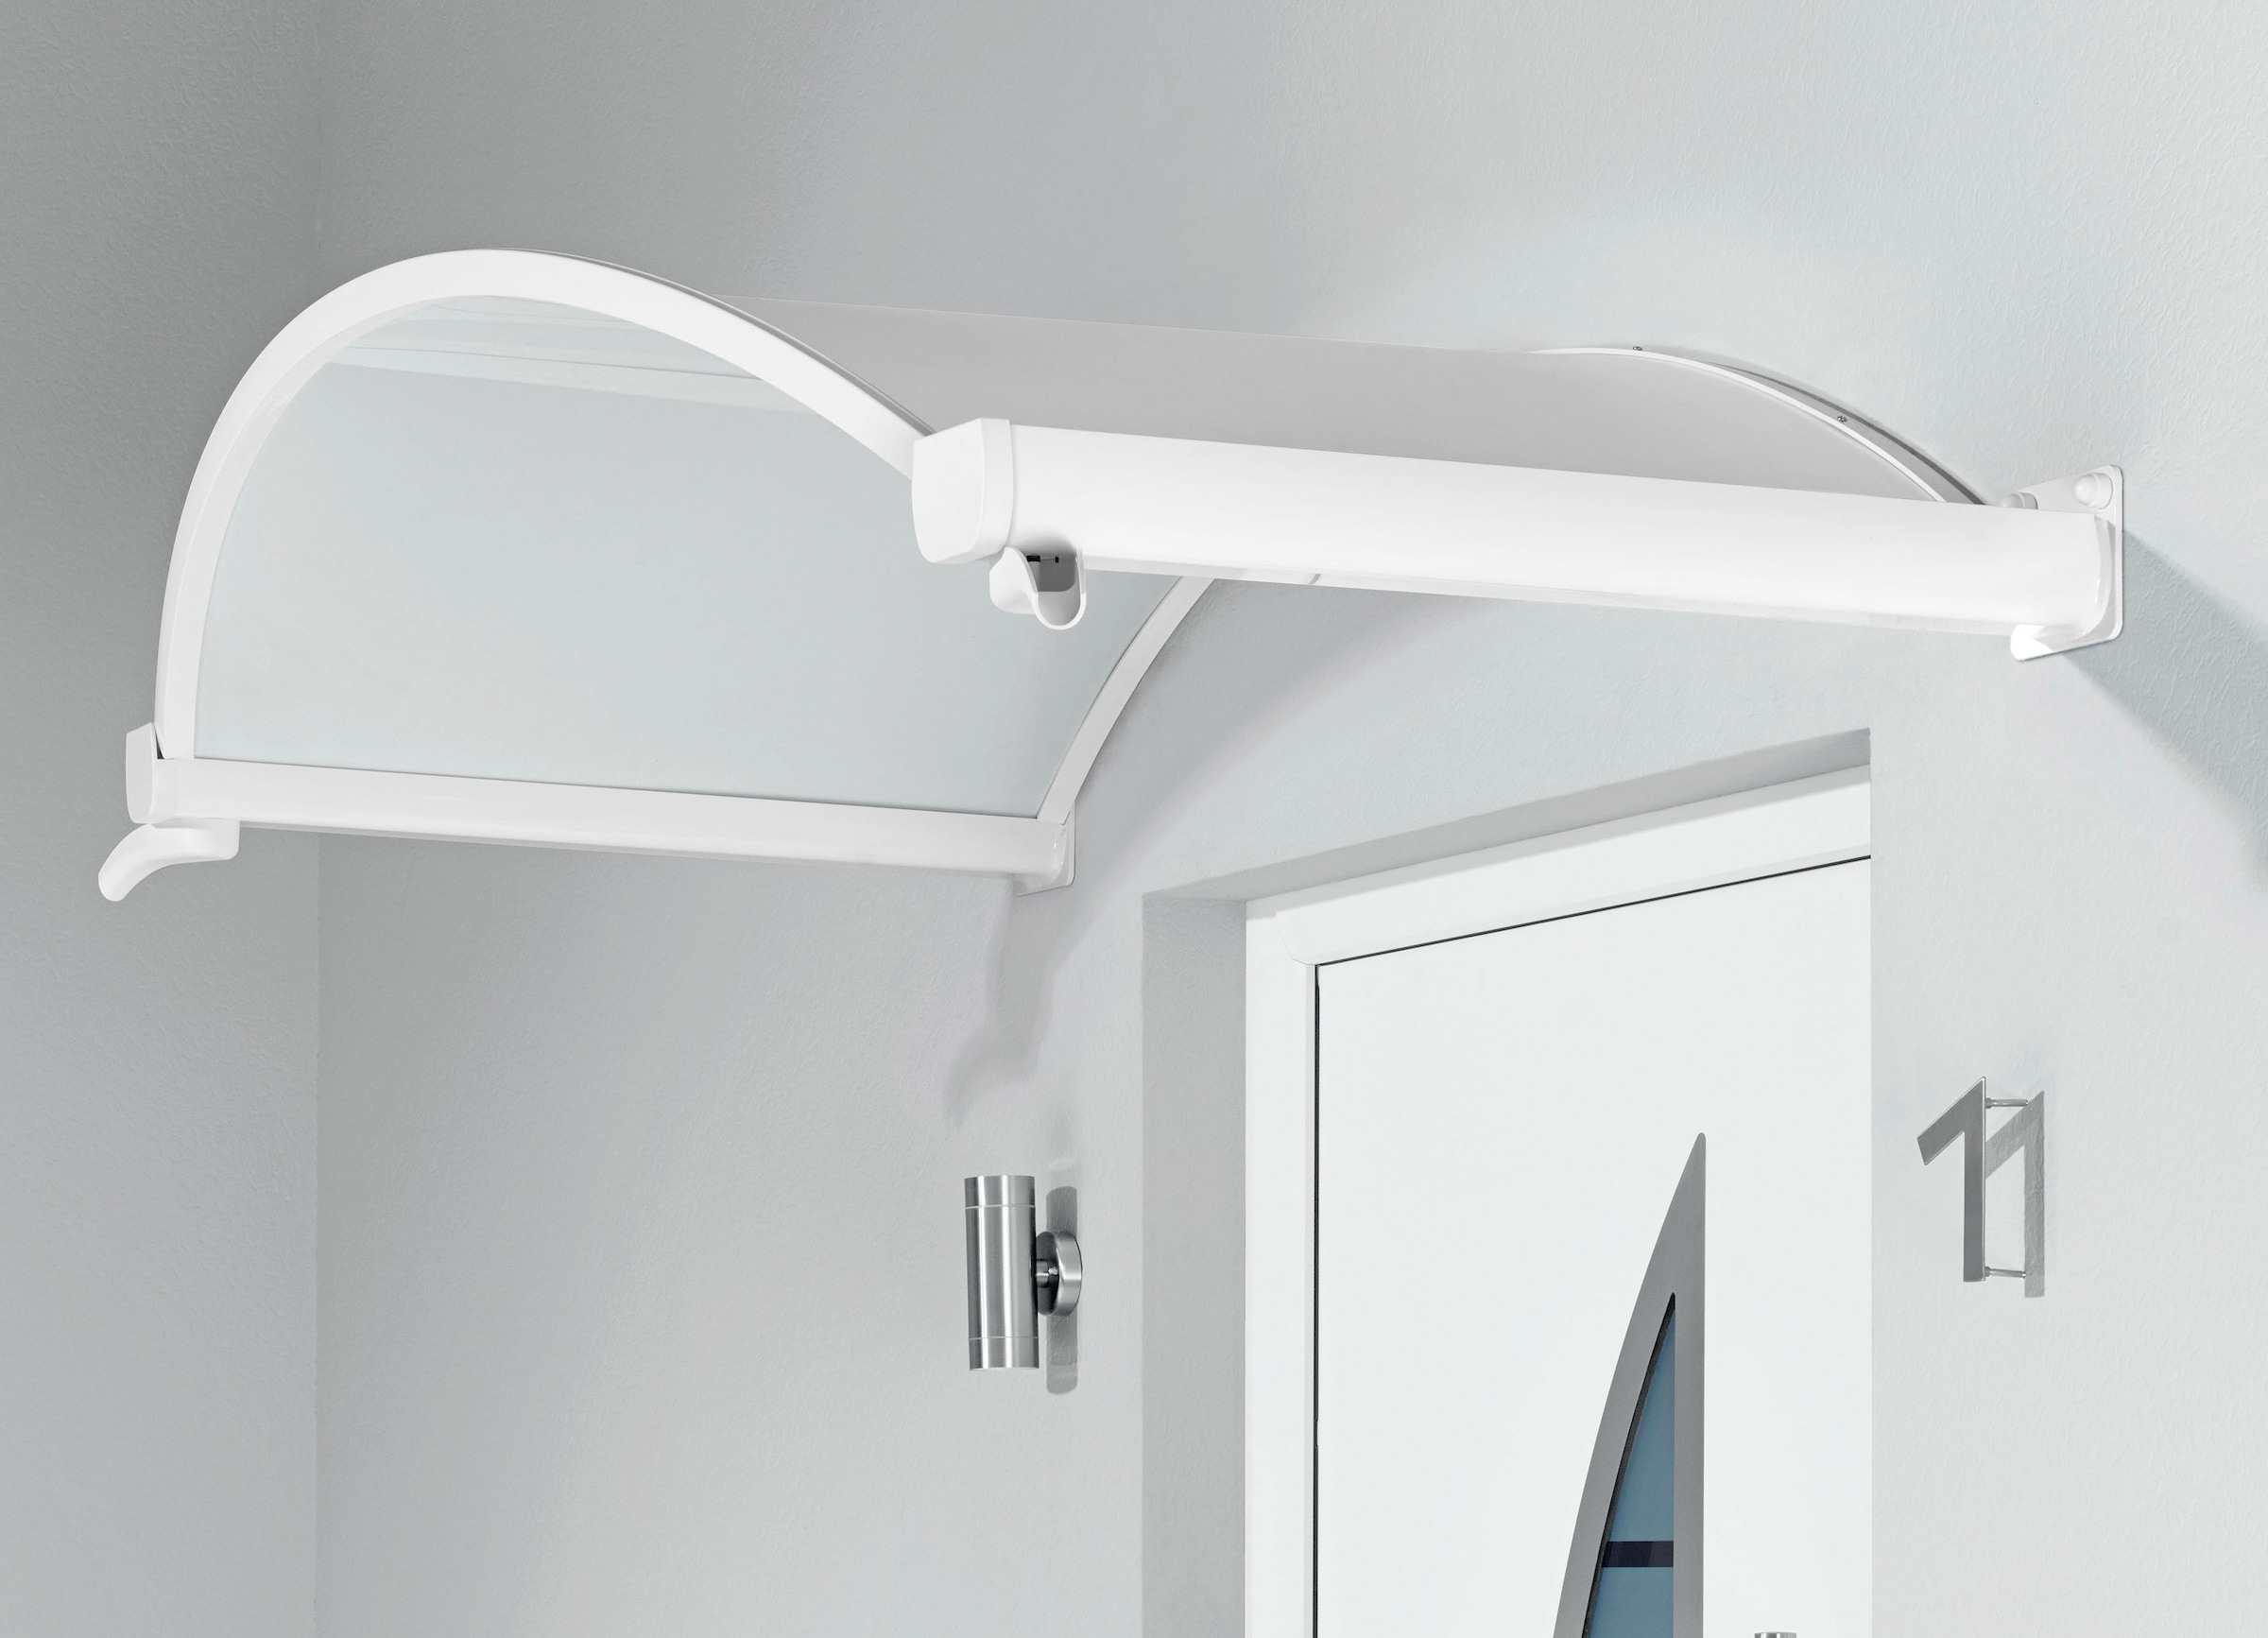 BxTxH weiß Vordach 200 x 90 x 30 cm Gutta Ovalbogenvordach OV//B 200